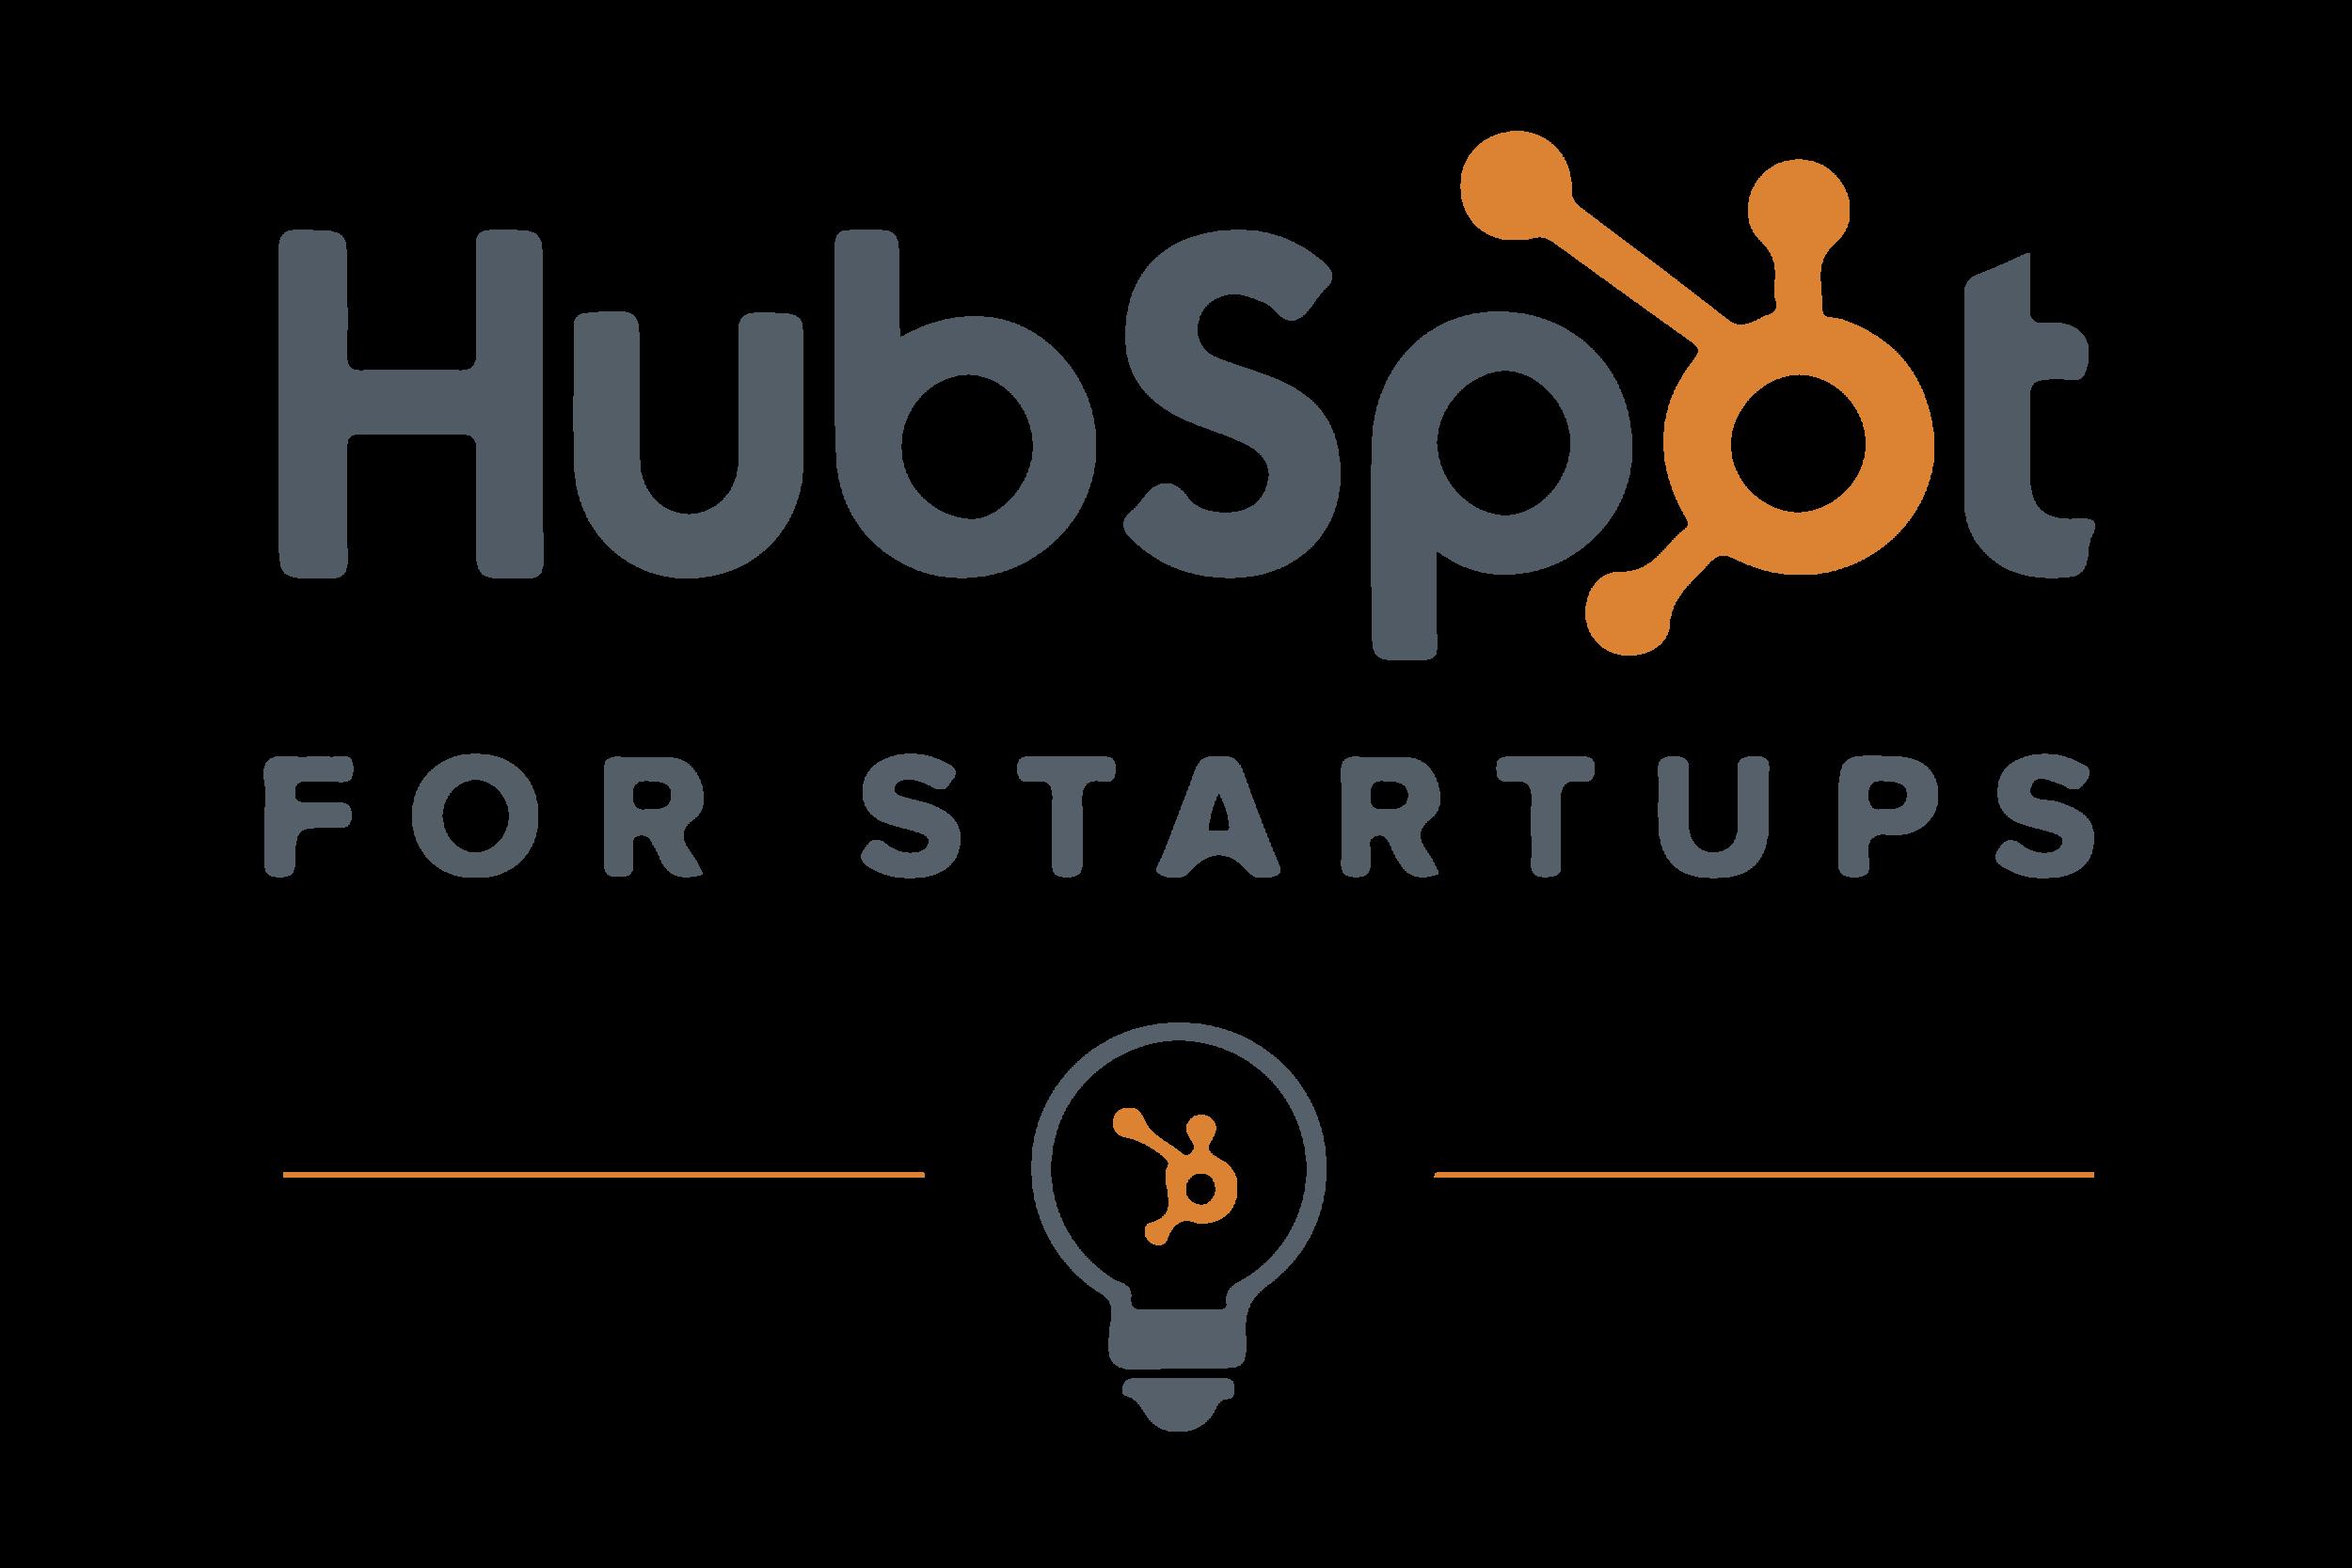 Logos_MASTER_Hubspot.png